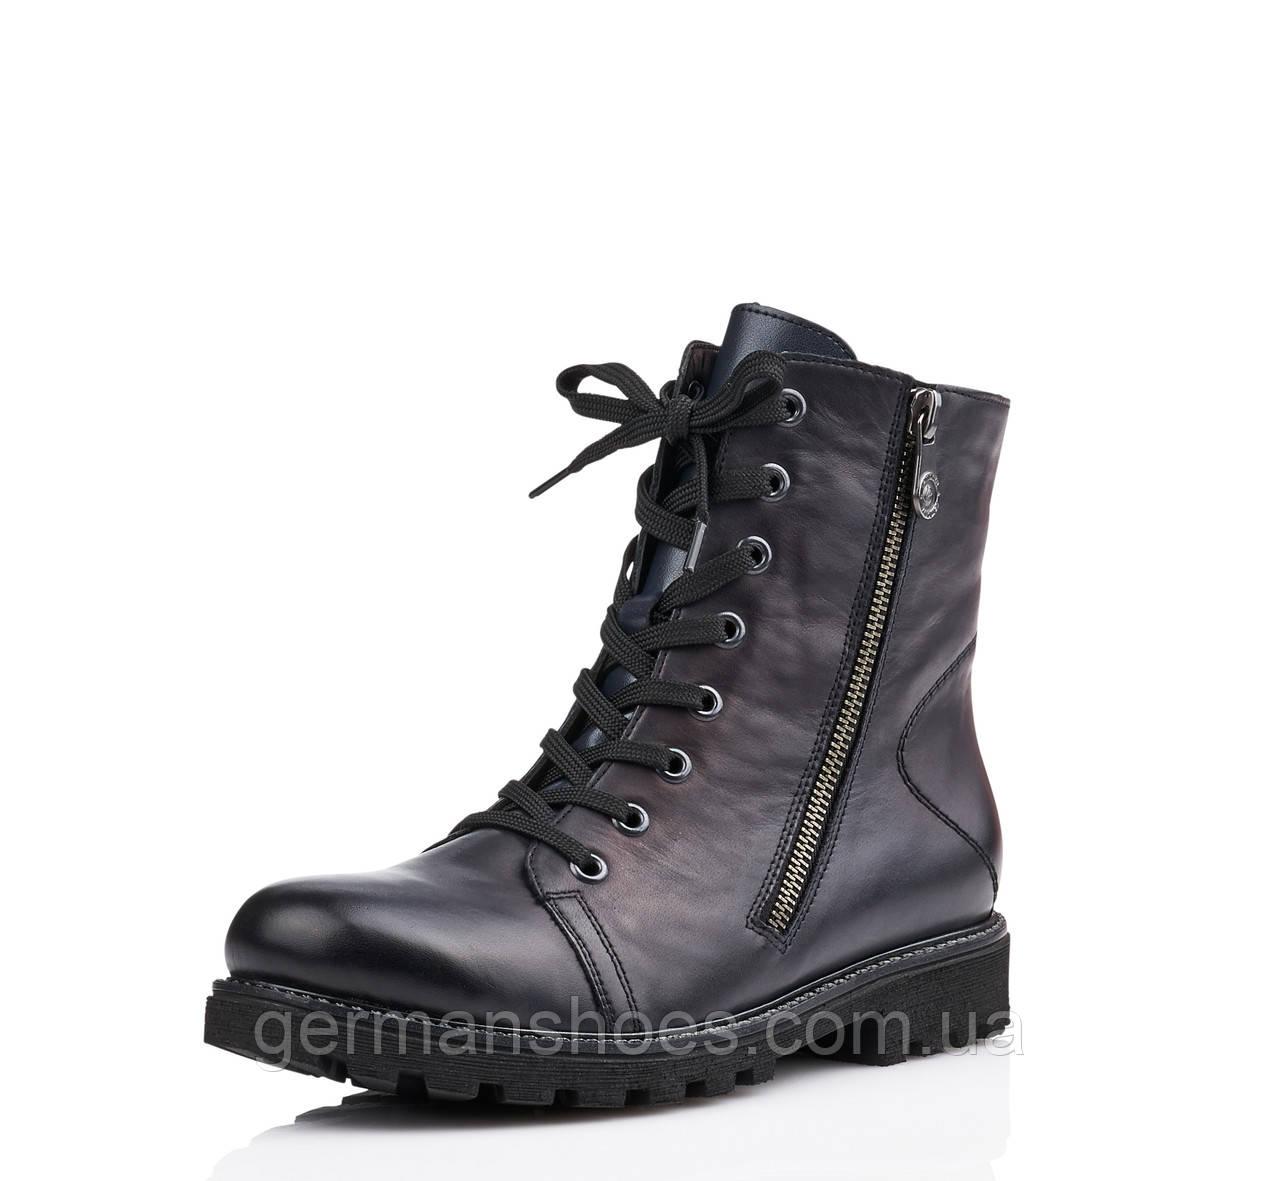 Ботинки женские Remonte D7475-14